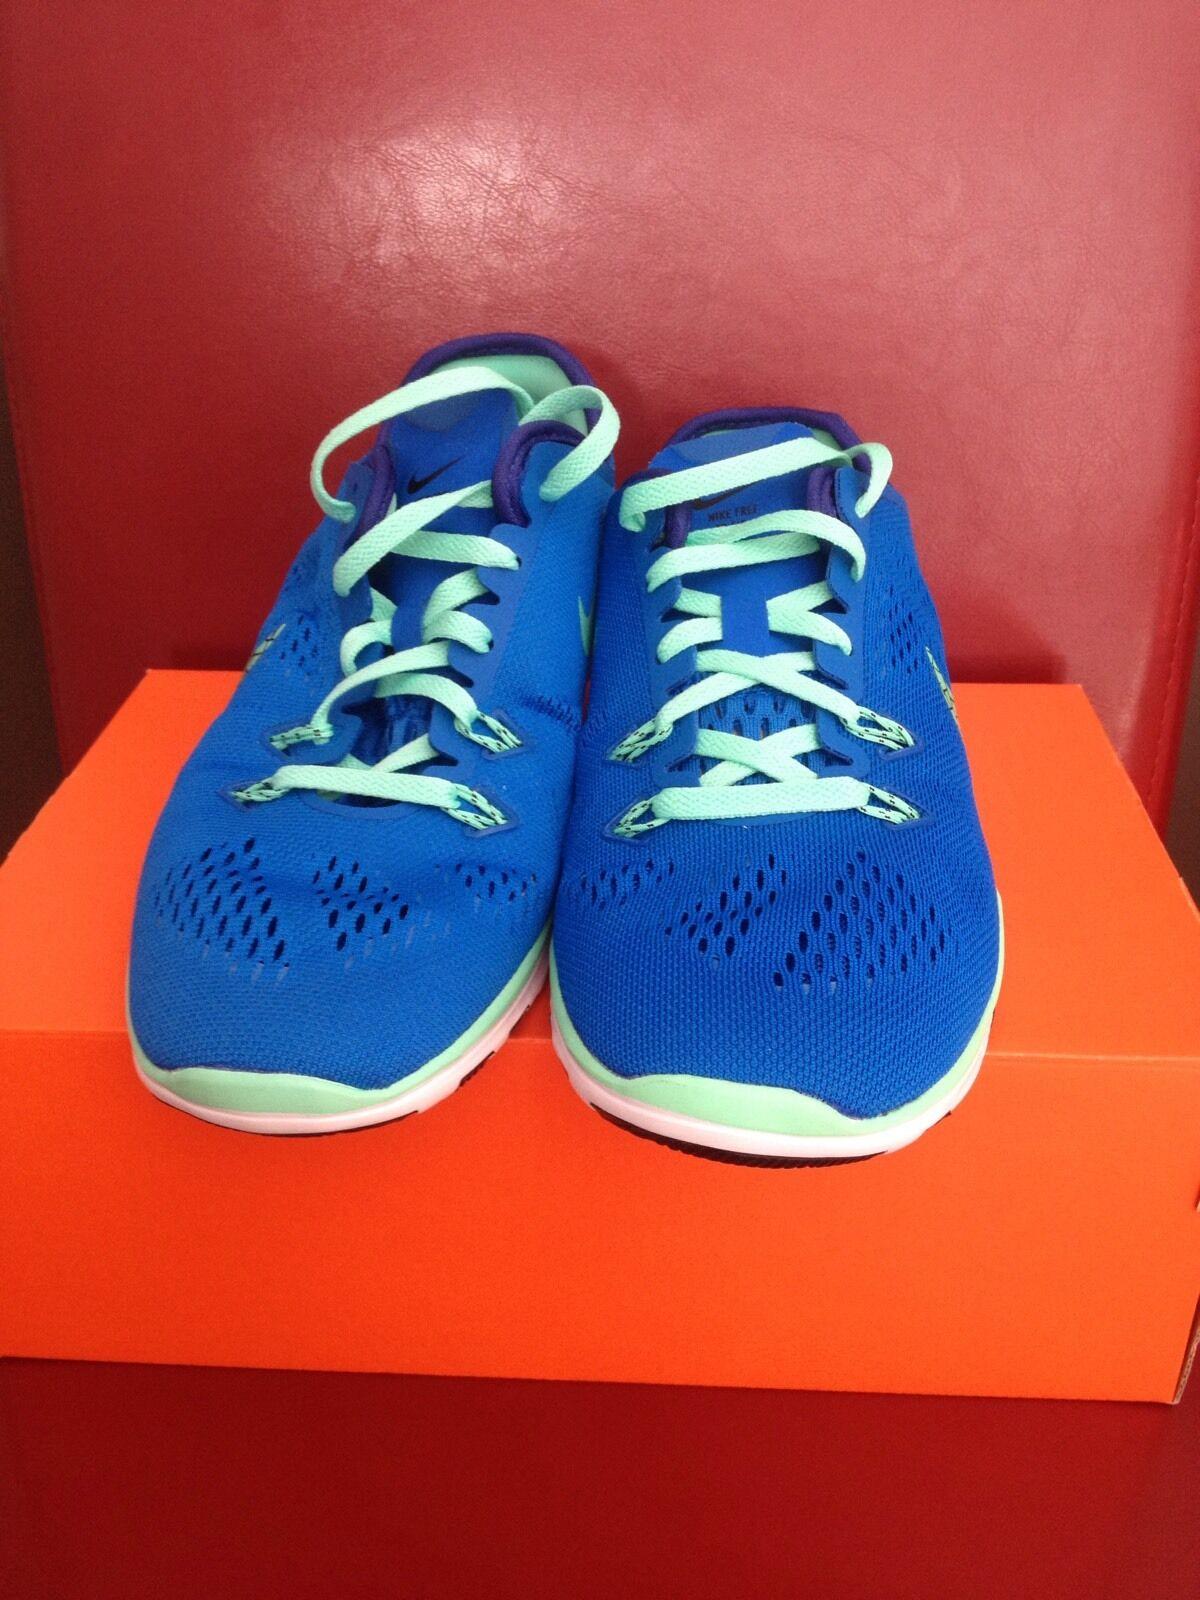 Nike Free 5.0 TR FIT Gr:Wählbar(718932 5 Brthe Damen Sportschuhe Gr:Wählbar(718932 FIT 401) neu in kar 88c1fb